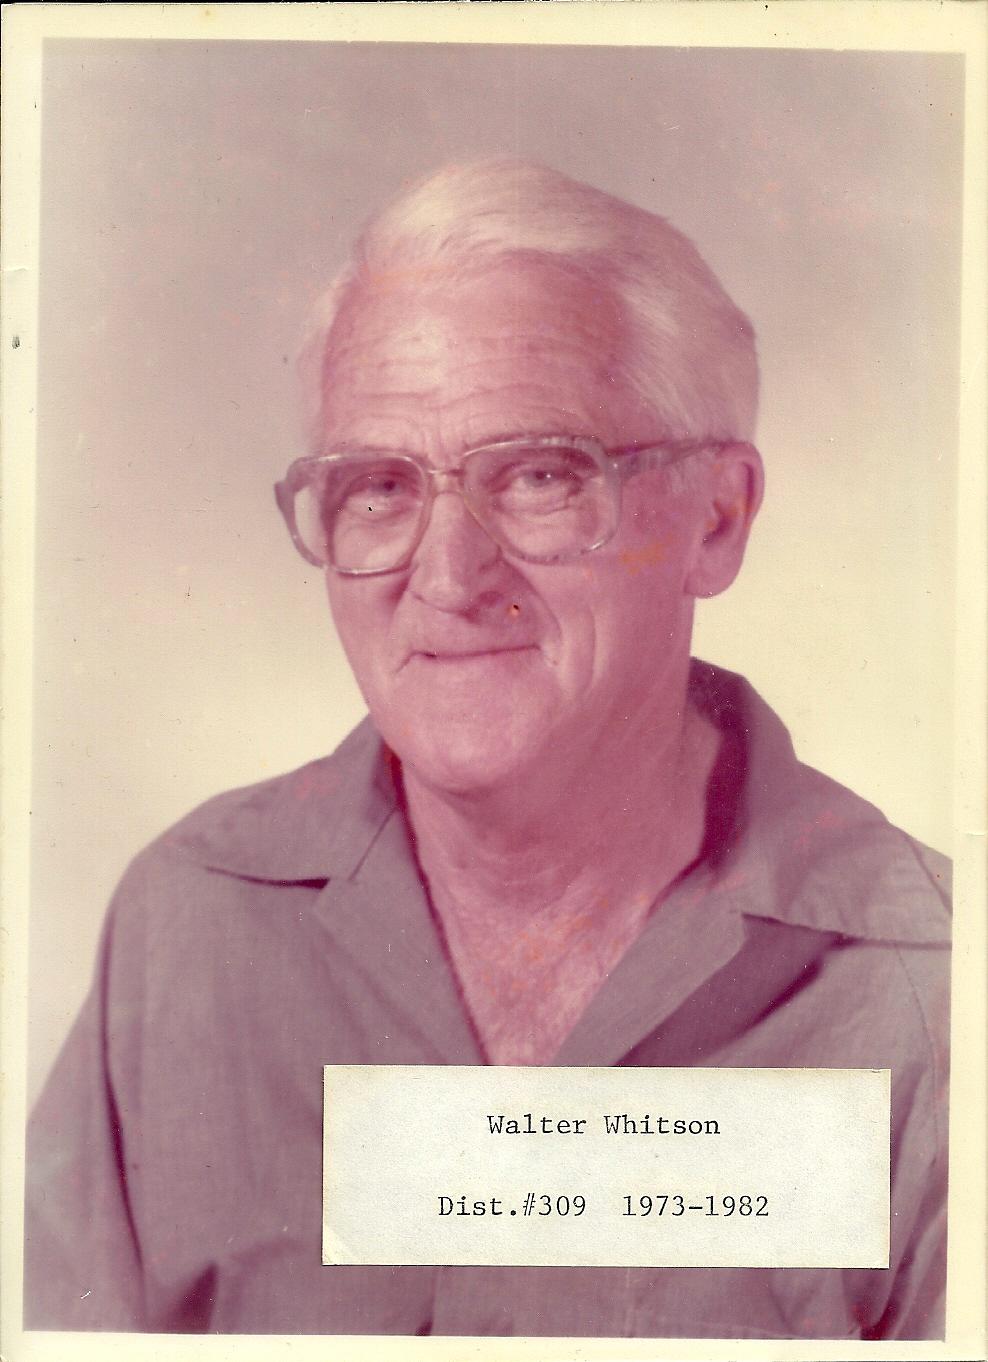 Walter Whitson